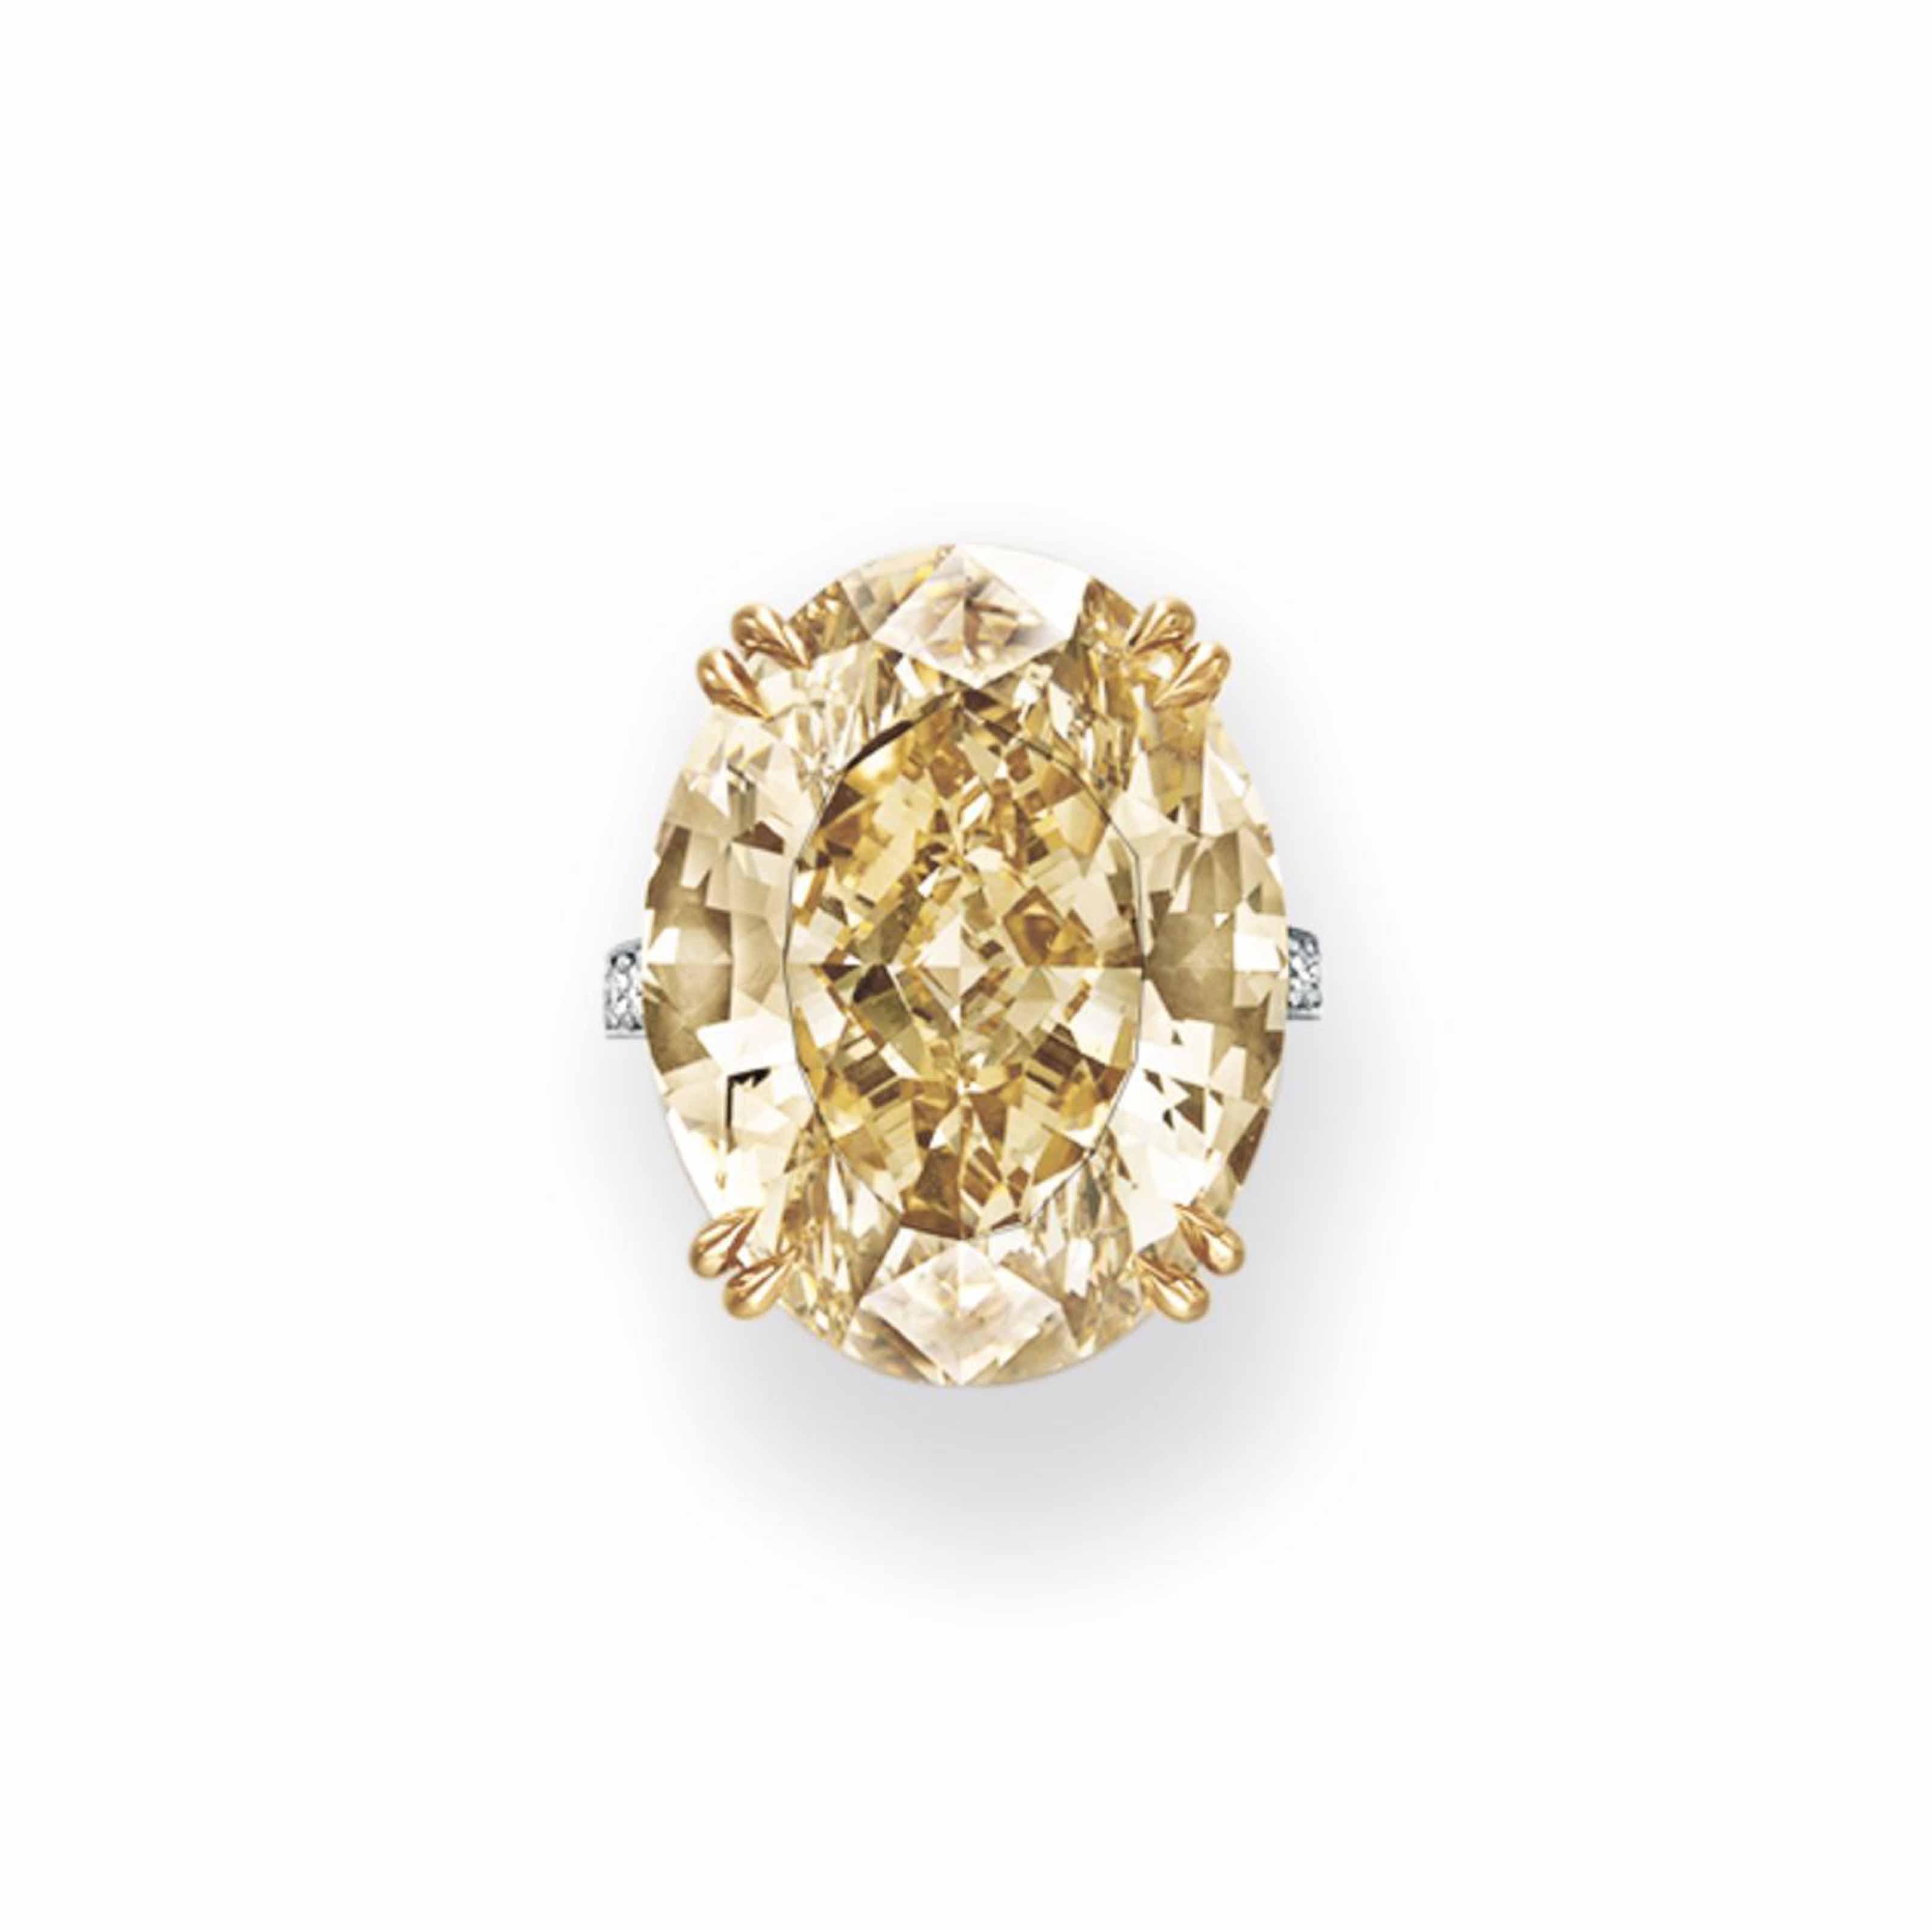 AN IMPRESSIVE COLORED DIAMOND